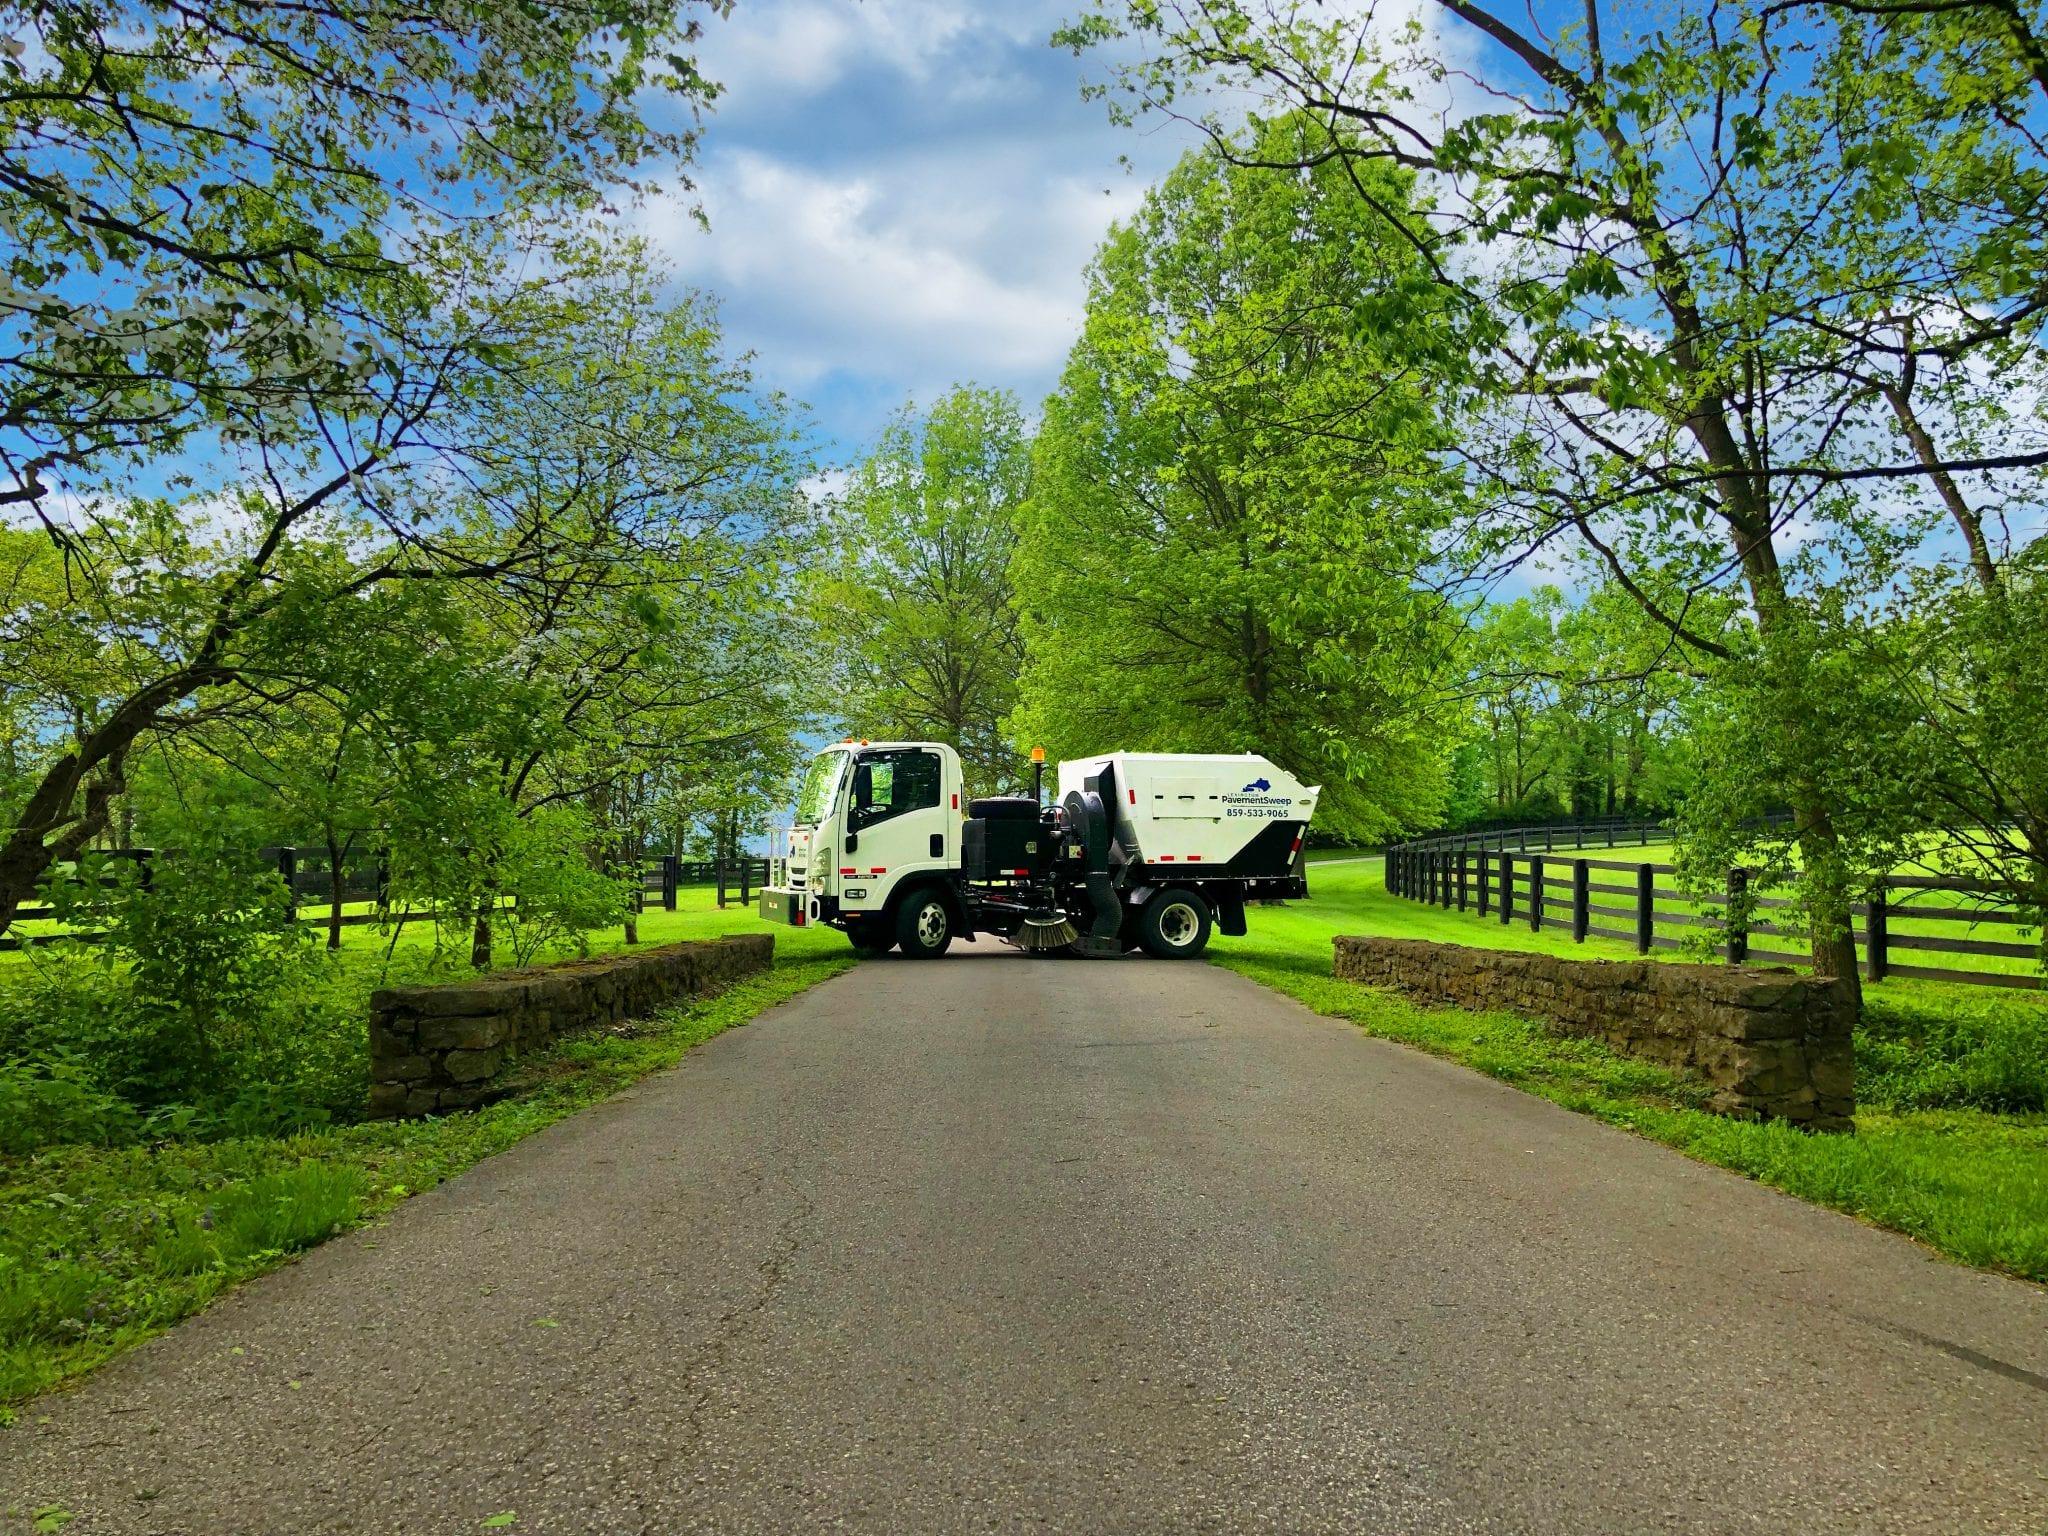 Lexington Kentucky Street Sweeper and Parking Lot Sweeping